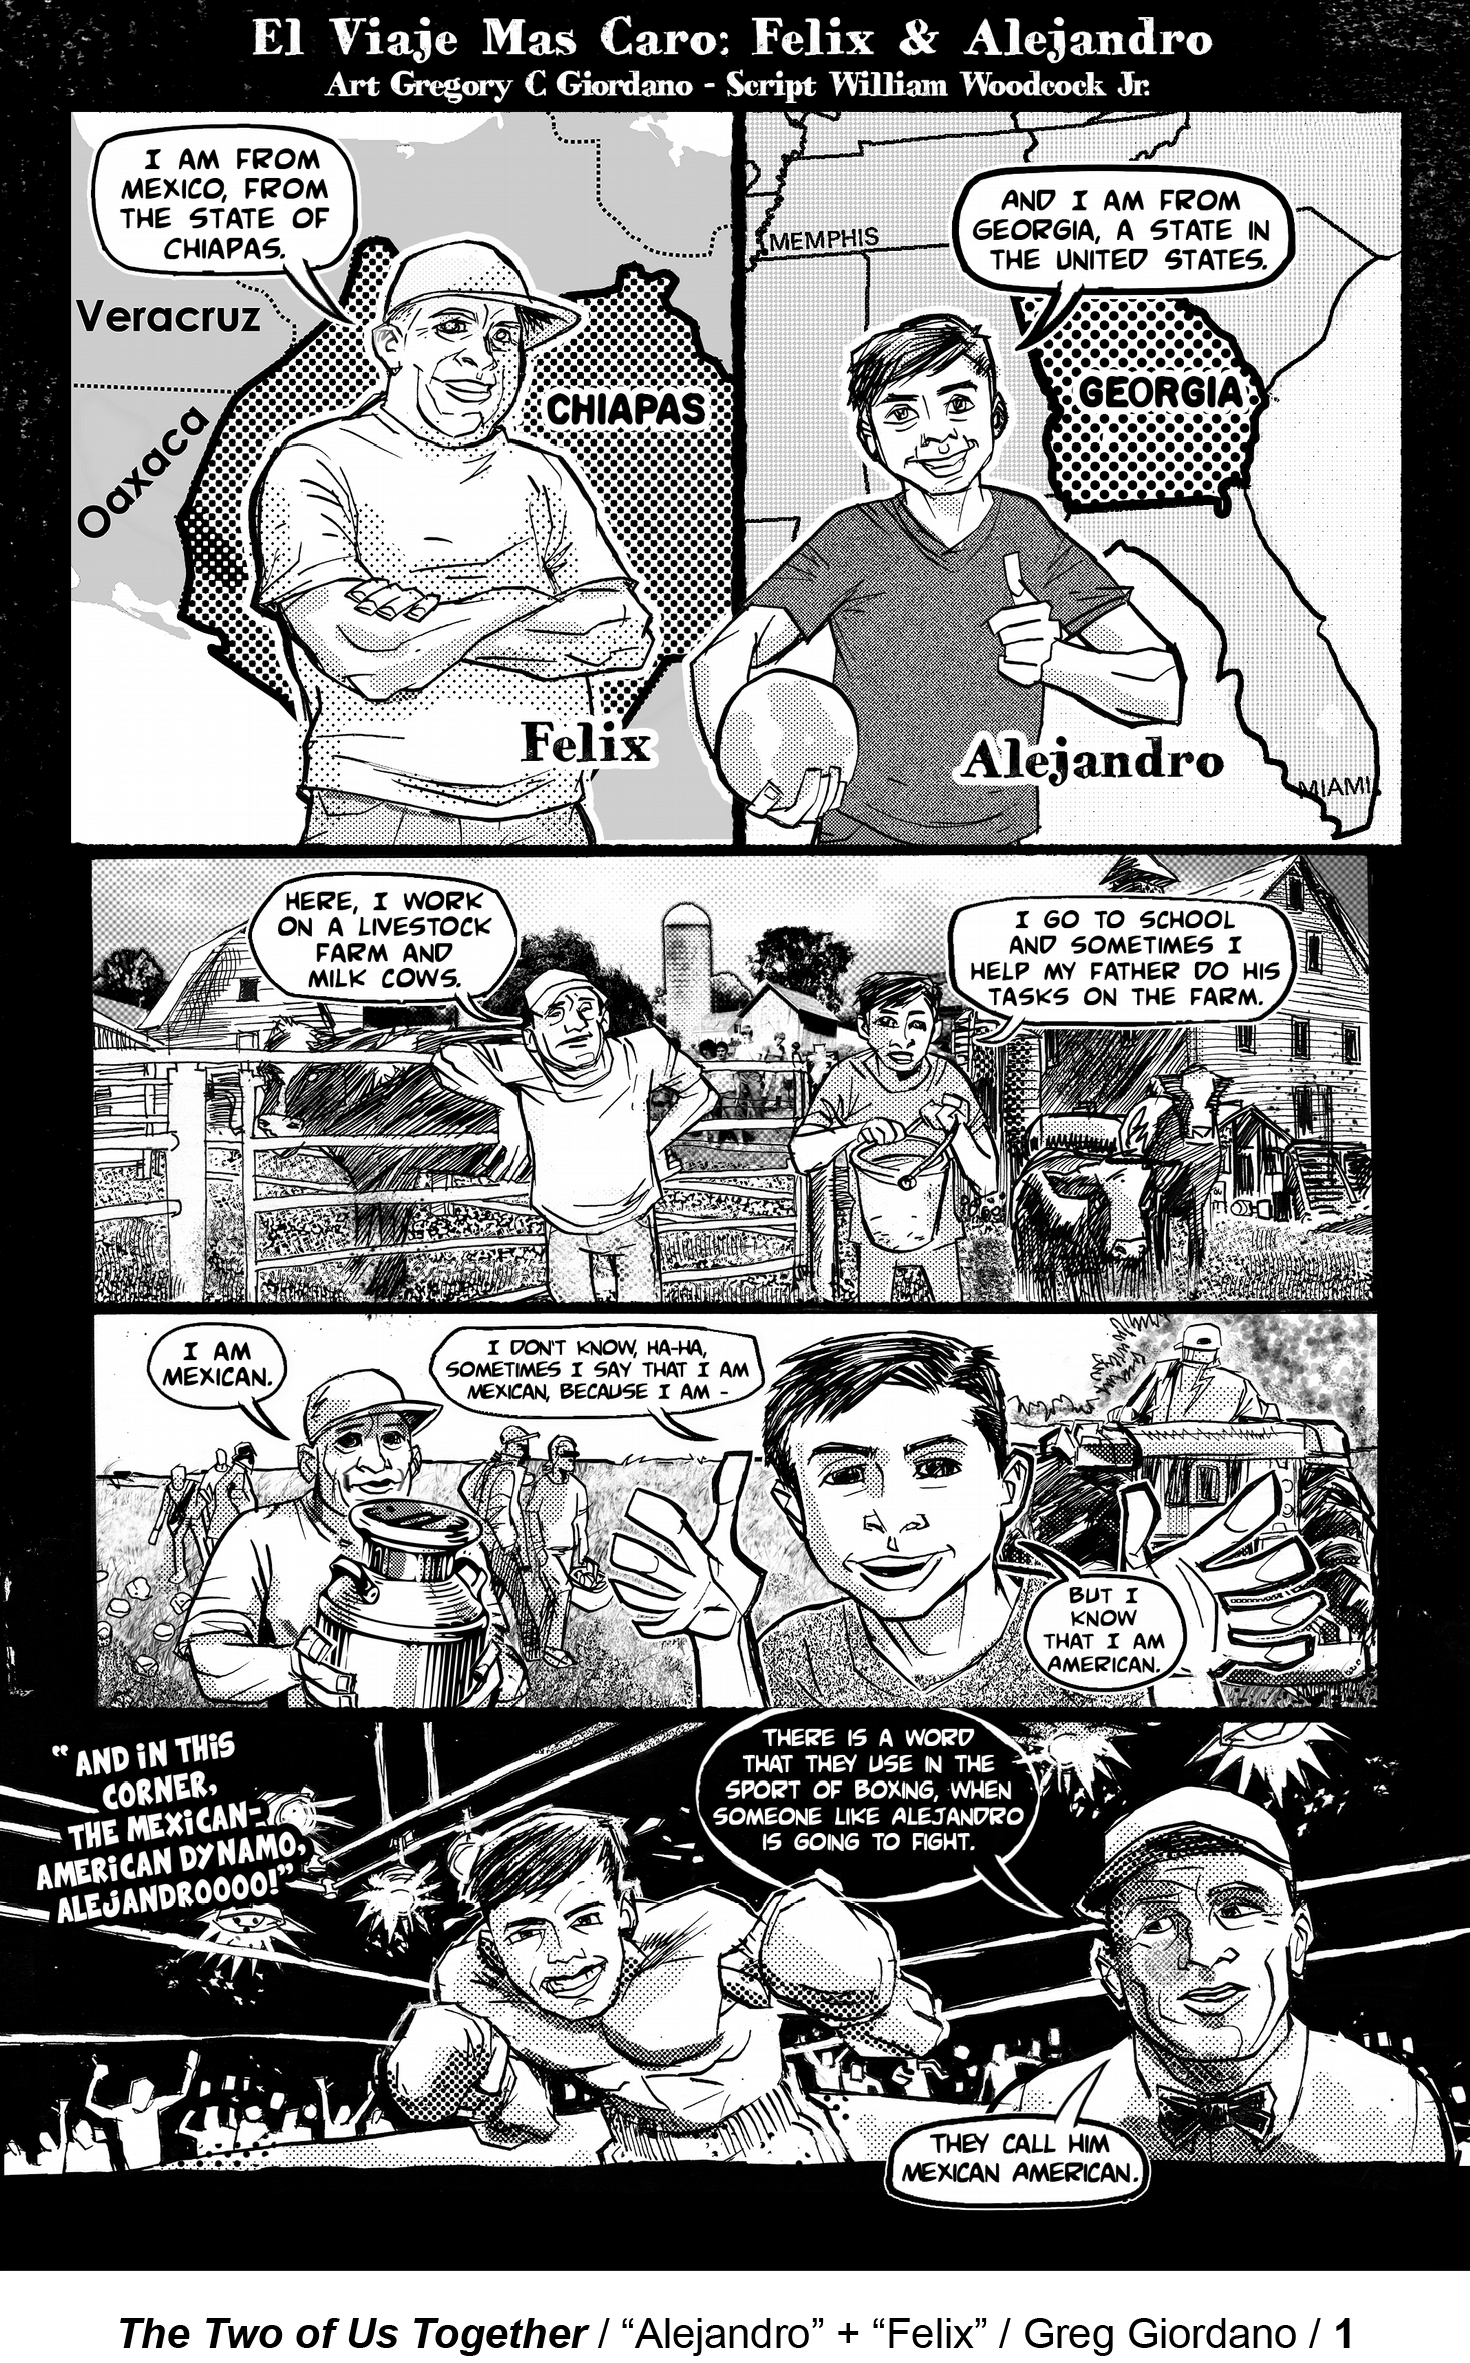 BOOKLET-Alejandro+Felix+Greg-171200-Digest_ENG 3.jpg